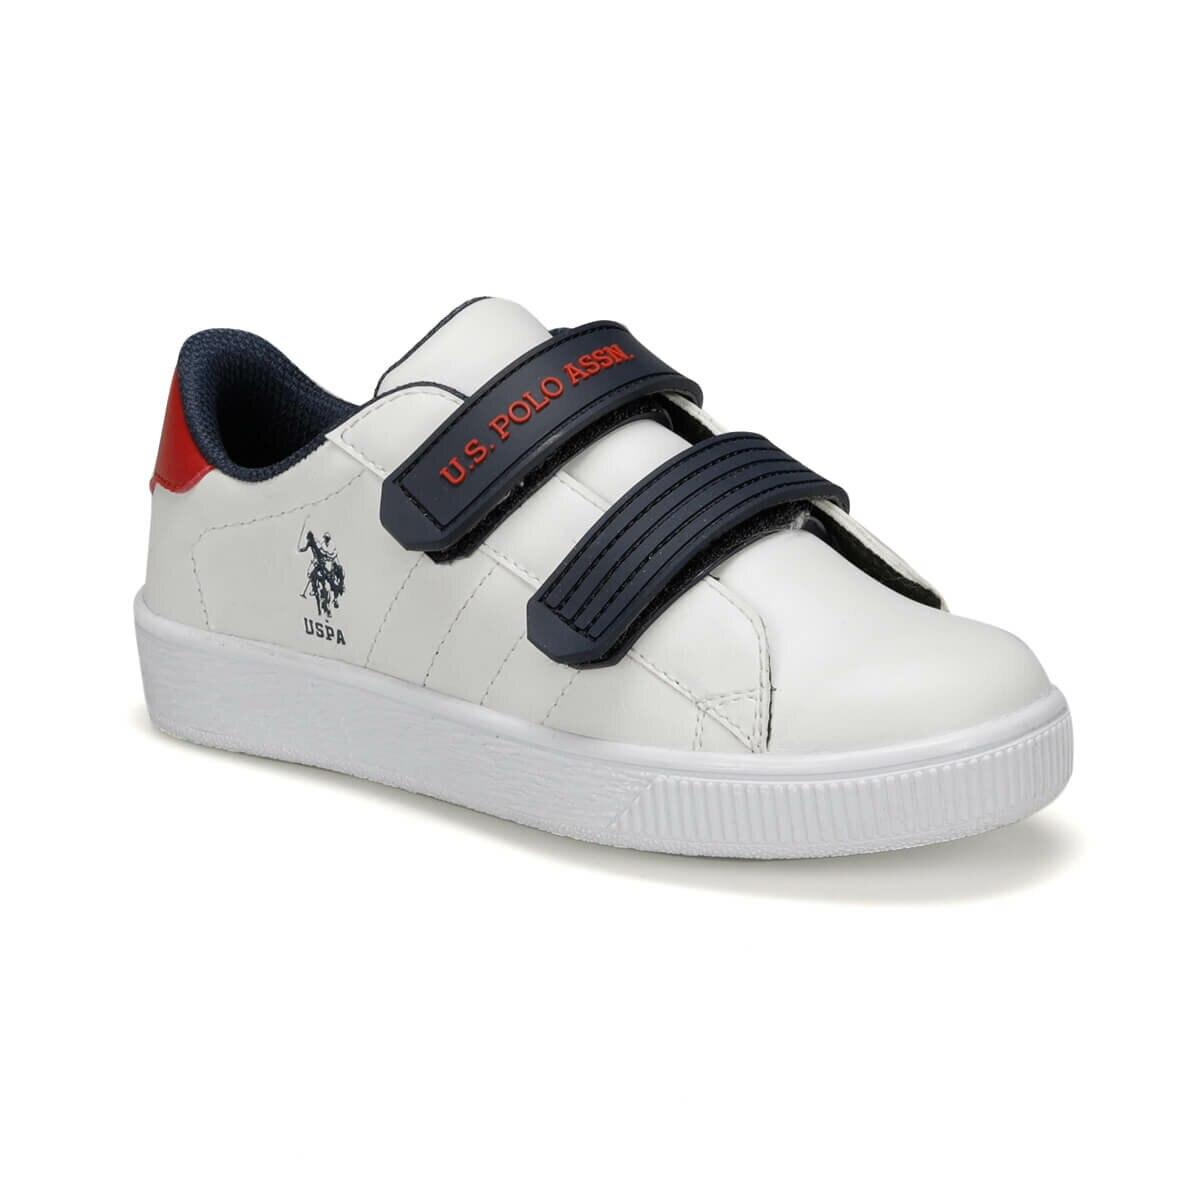 FLO CINO 9PR White Male Child Sneaker Shoes U.S. POLO ASSN.